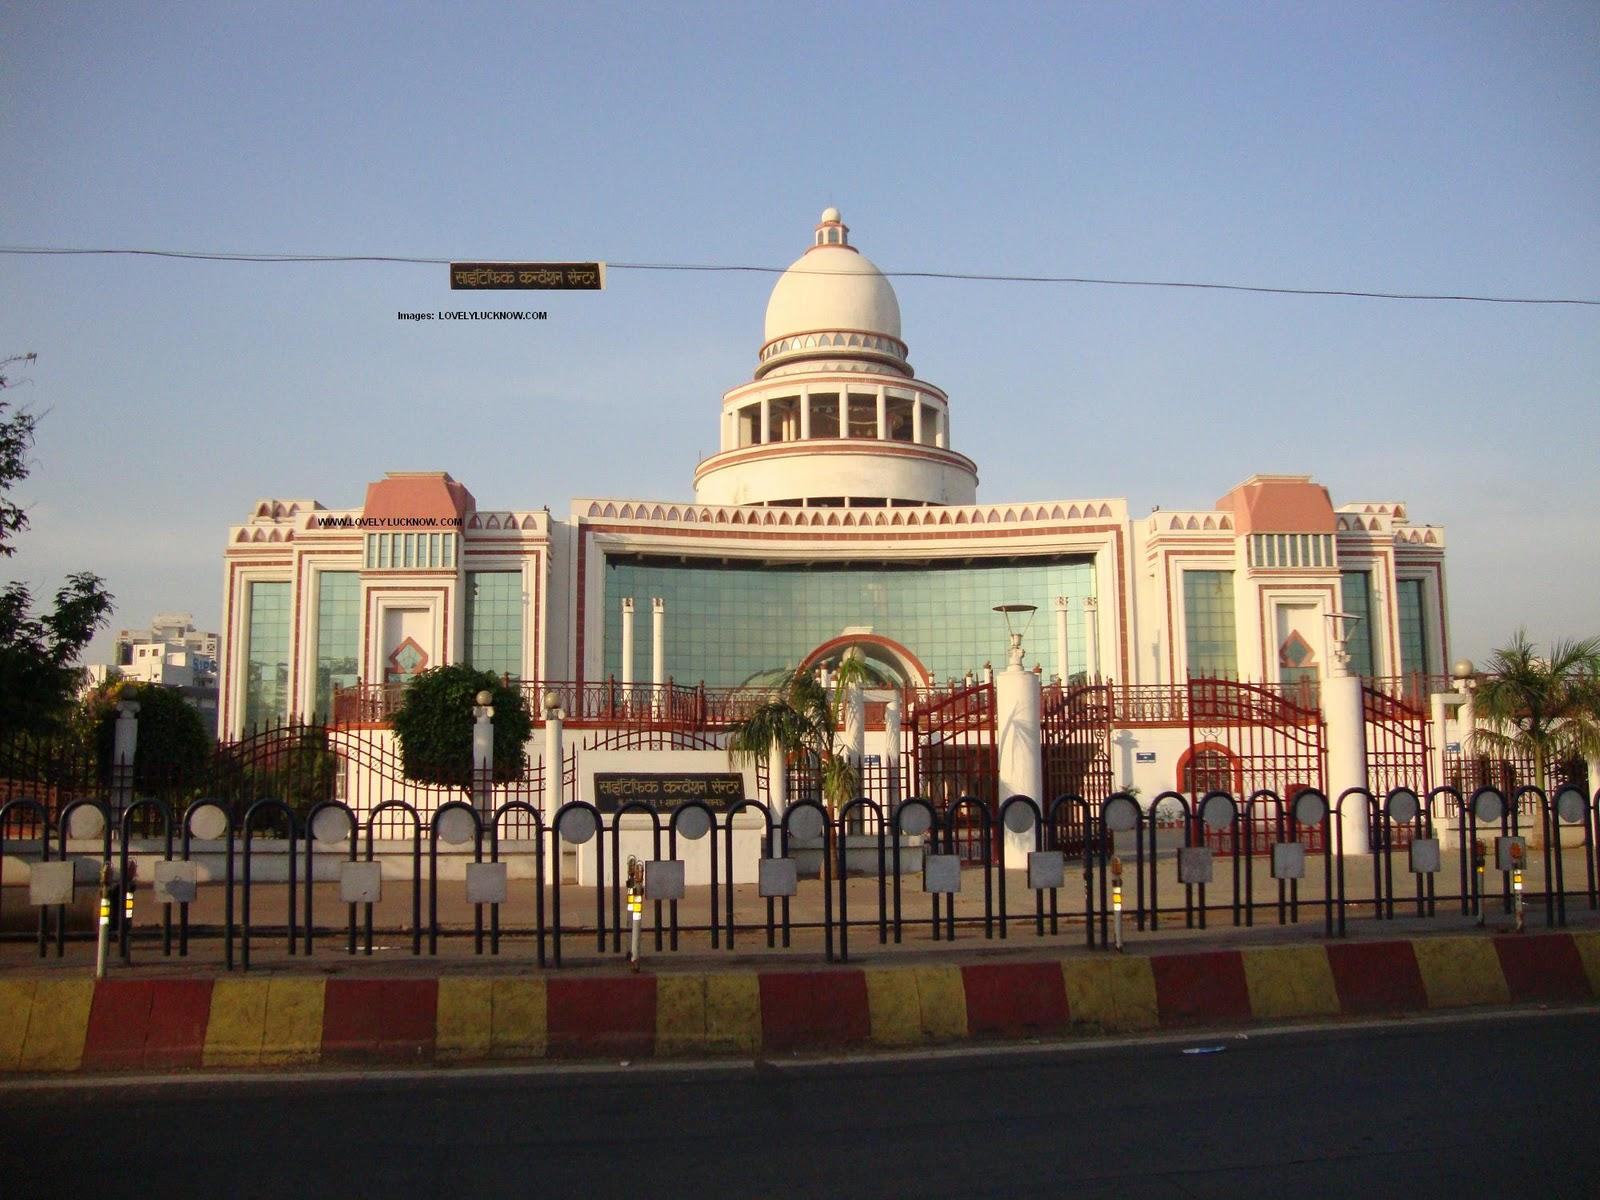 Lucknow Photos Pictures Images Scientific Convention Centre Lucknow